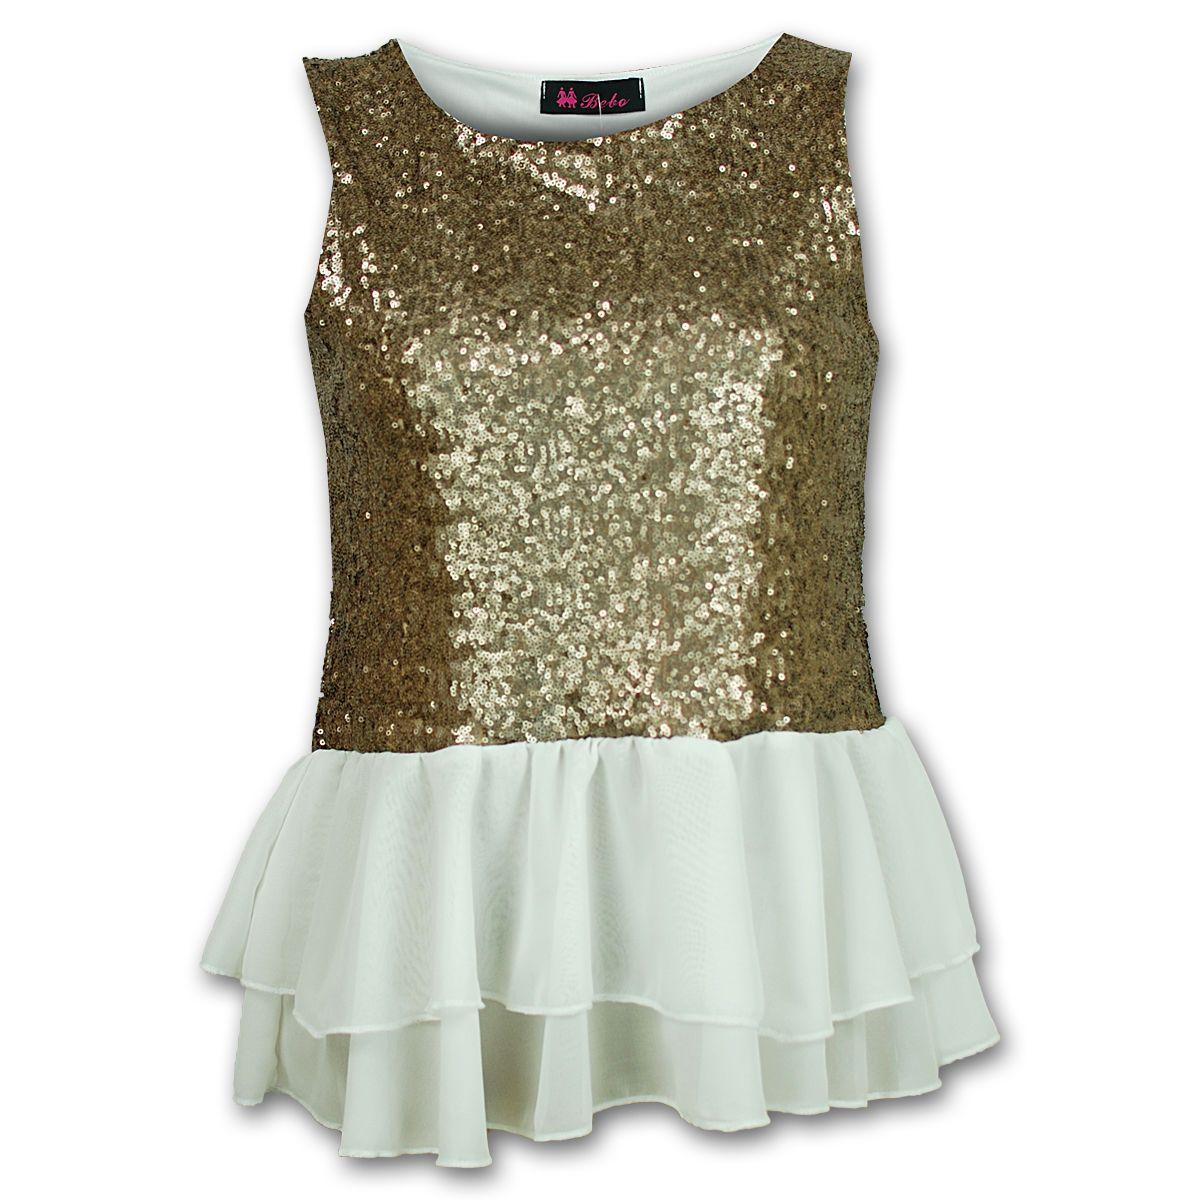 Ladies Top Womens Dress Sequin Pattern Peplum Frill Chiffon Sleeveless Party | eBay